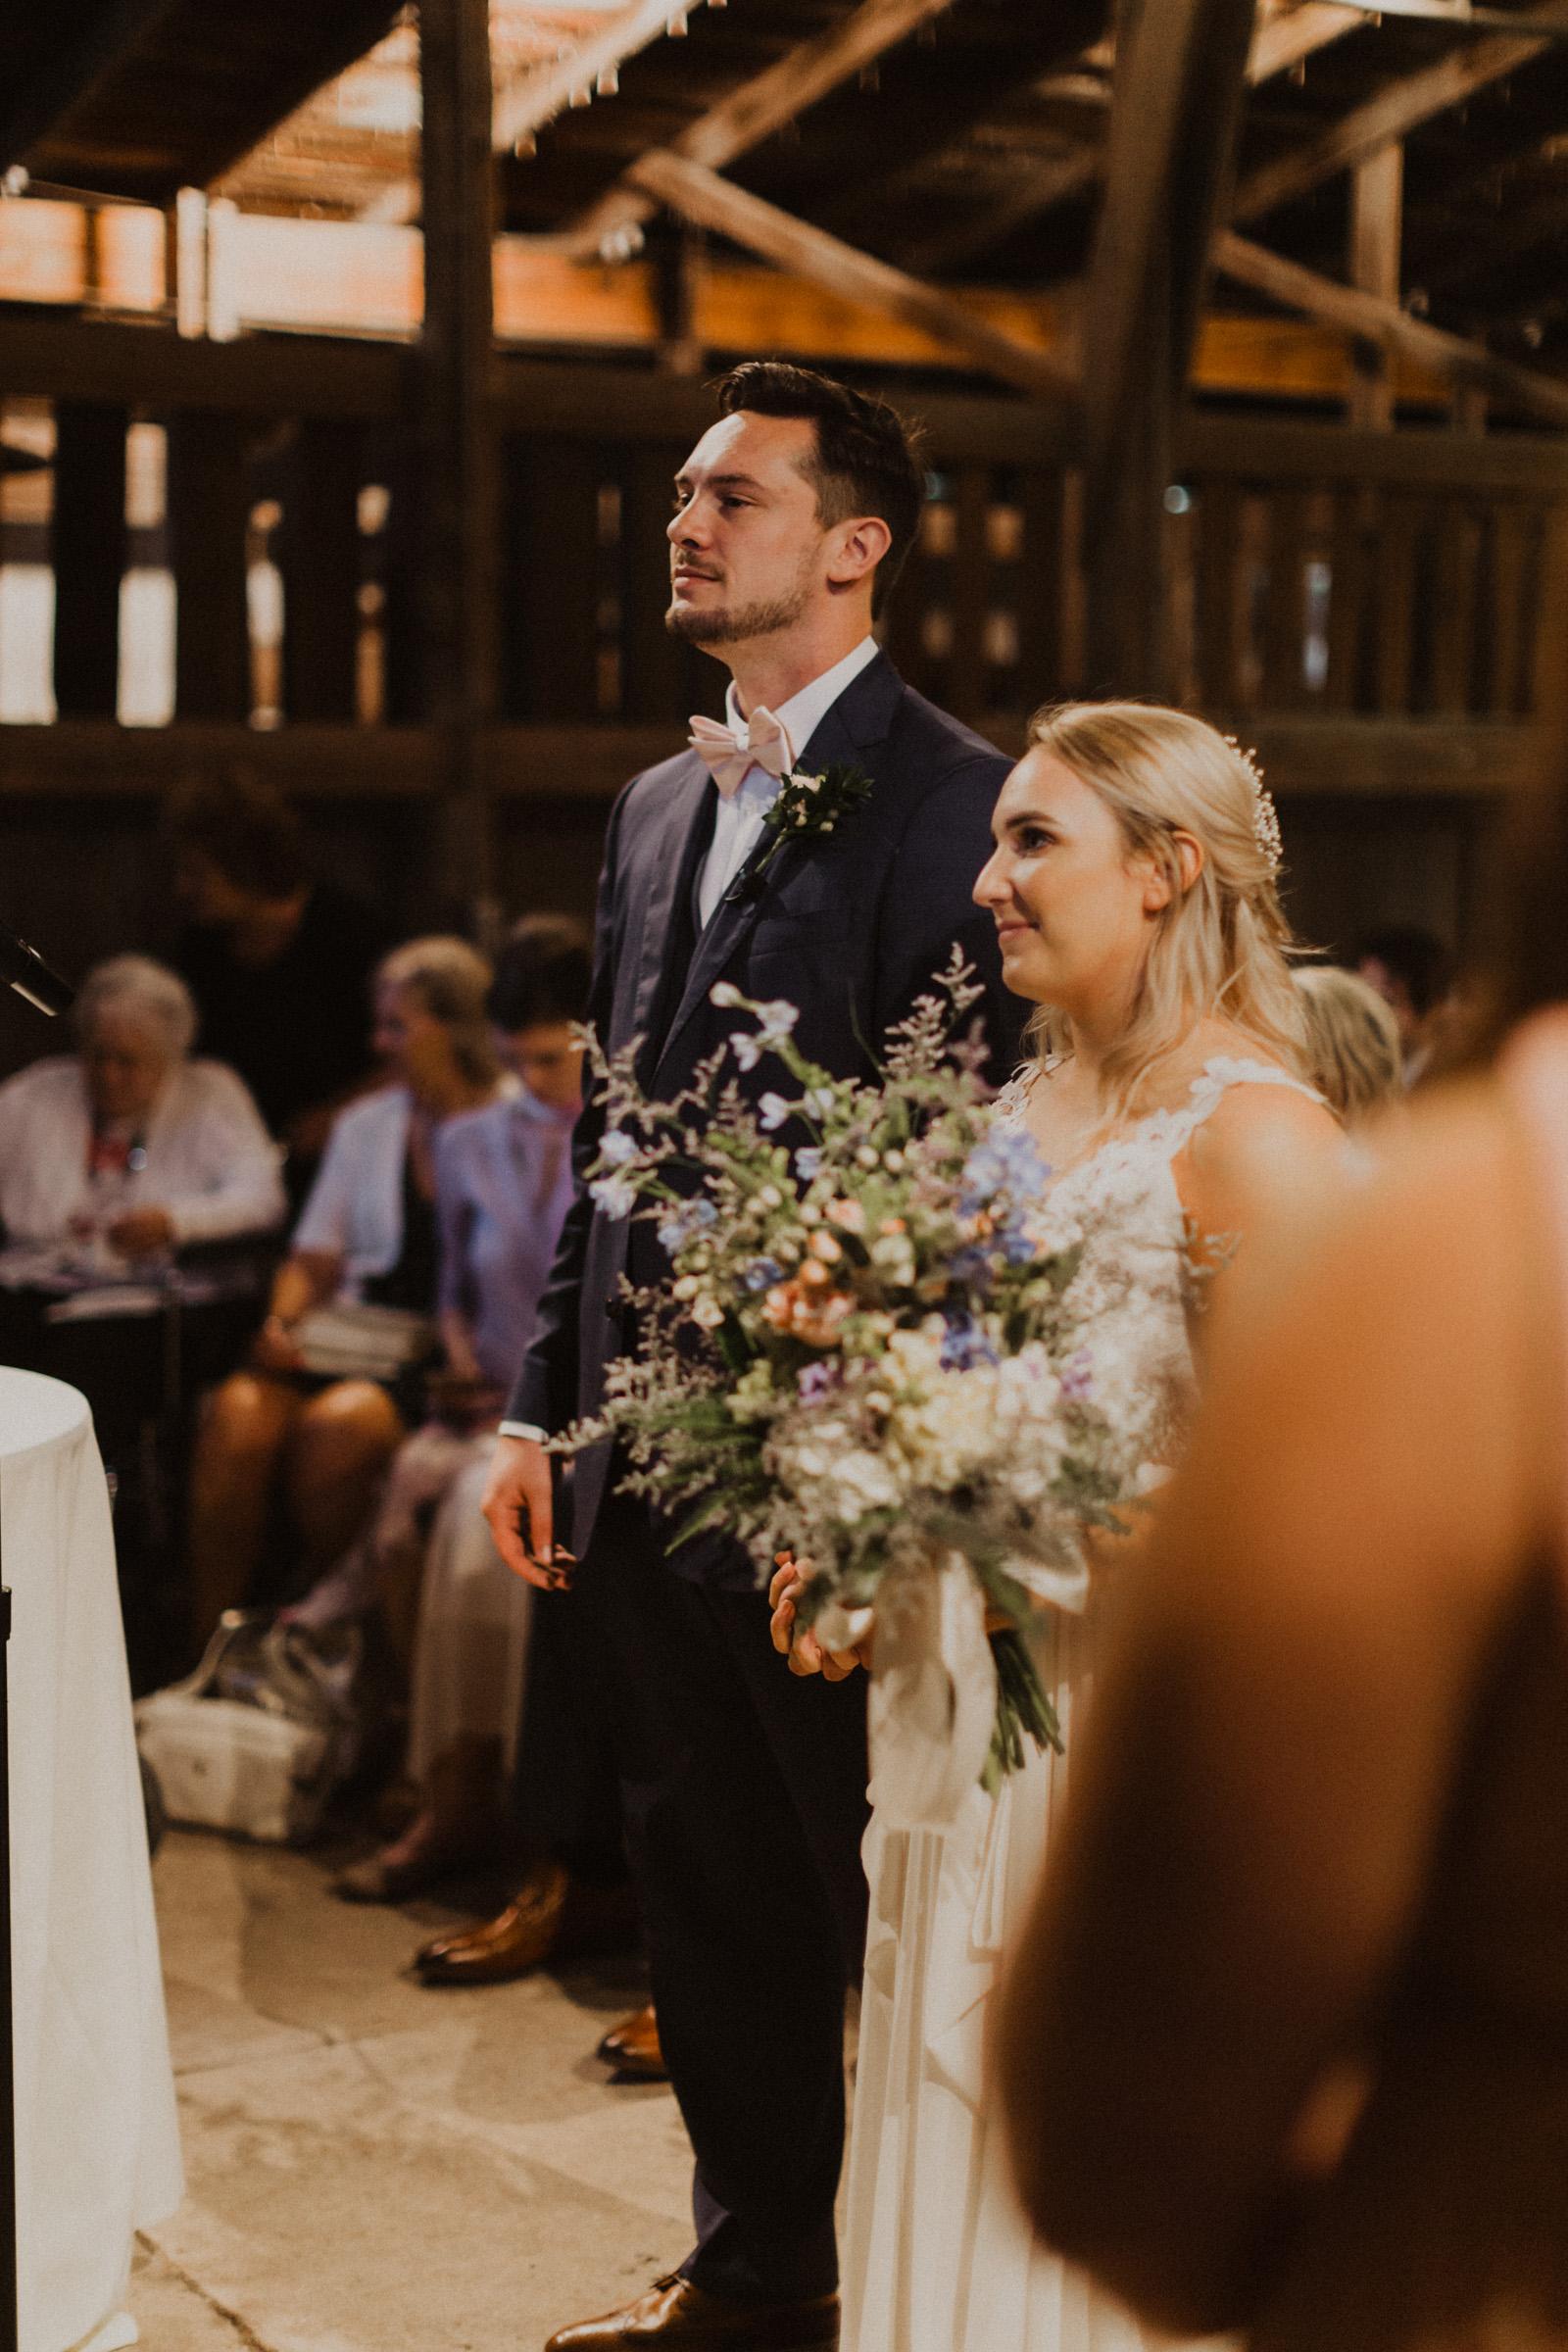 alyssa barletter photography nelson wedding nebraska city lied lodge morton barn spring wedding photographer-35.jpg